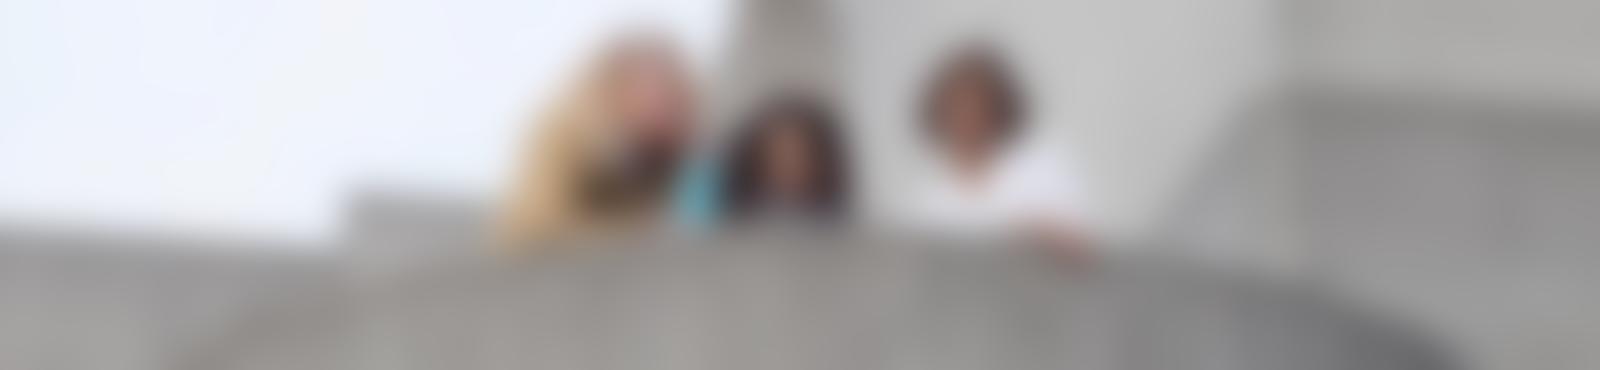 Blurred 9f9c5065 a48f 40f9 9879 422a4dc1ce96